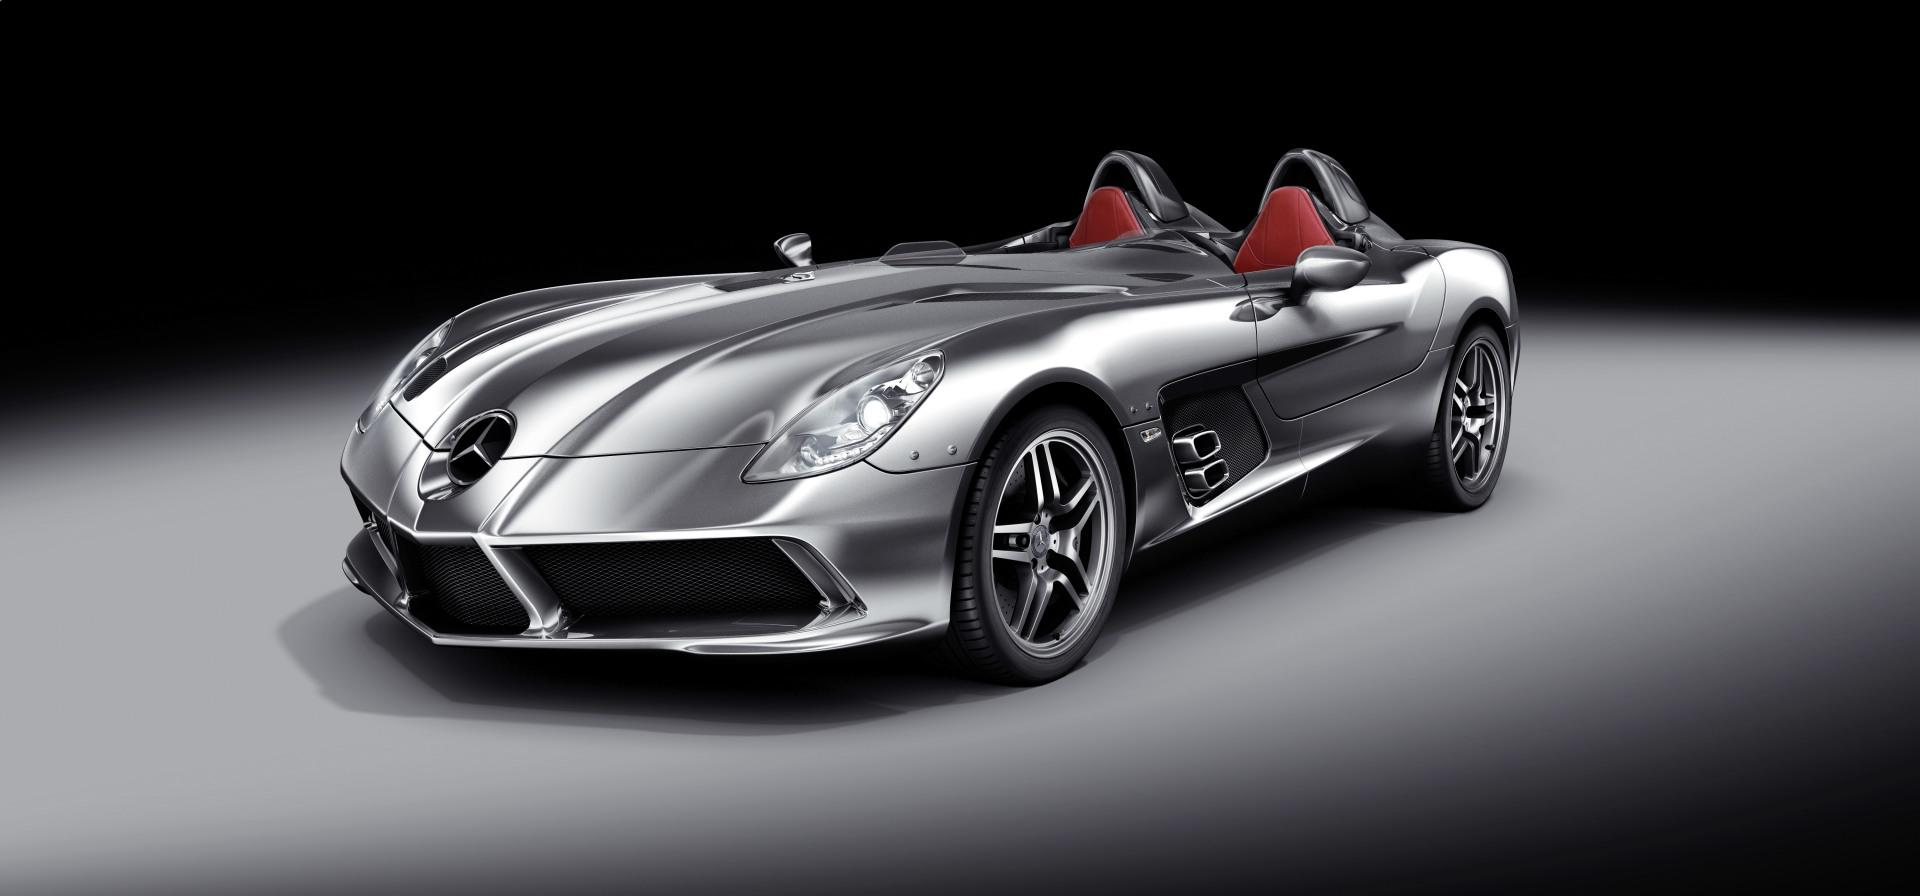 2009 Mercedes Benz Slr Stirling Moss Conceptcarz Com